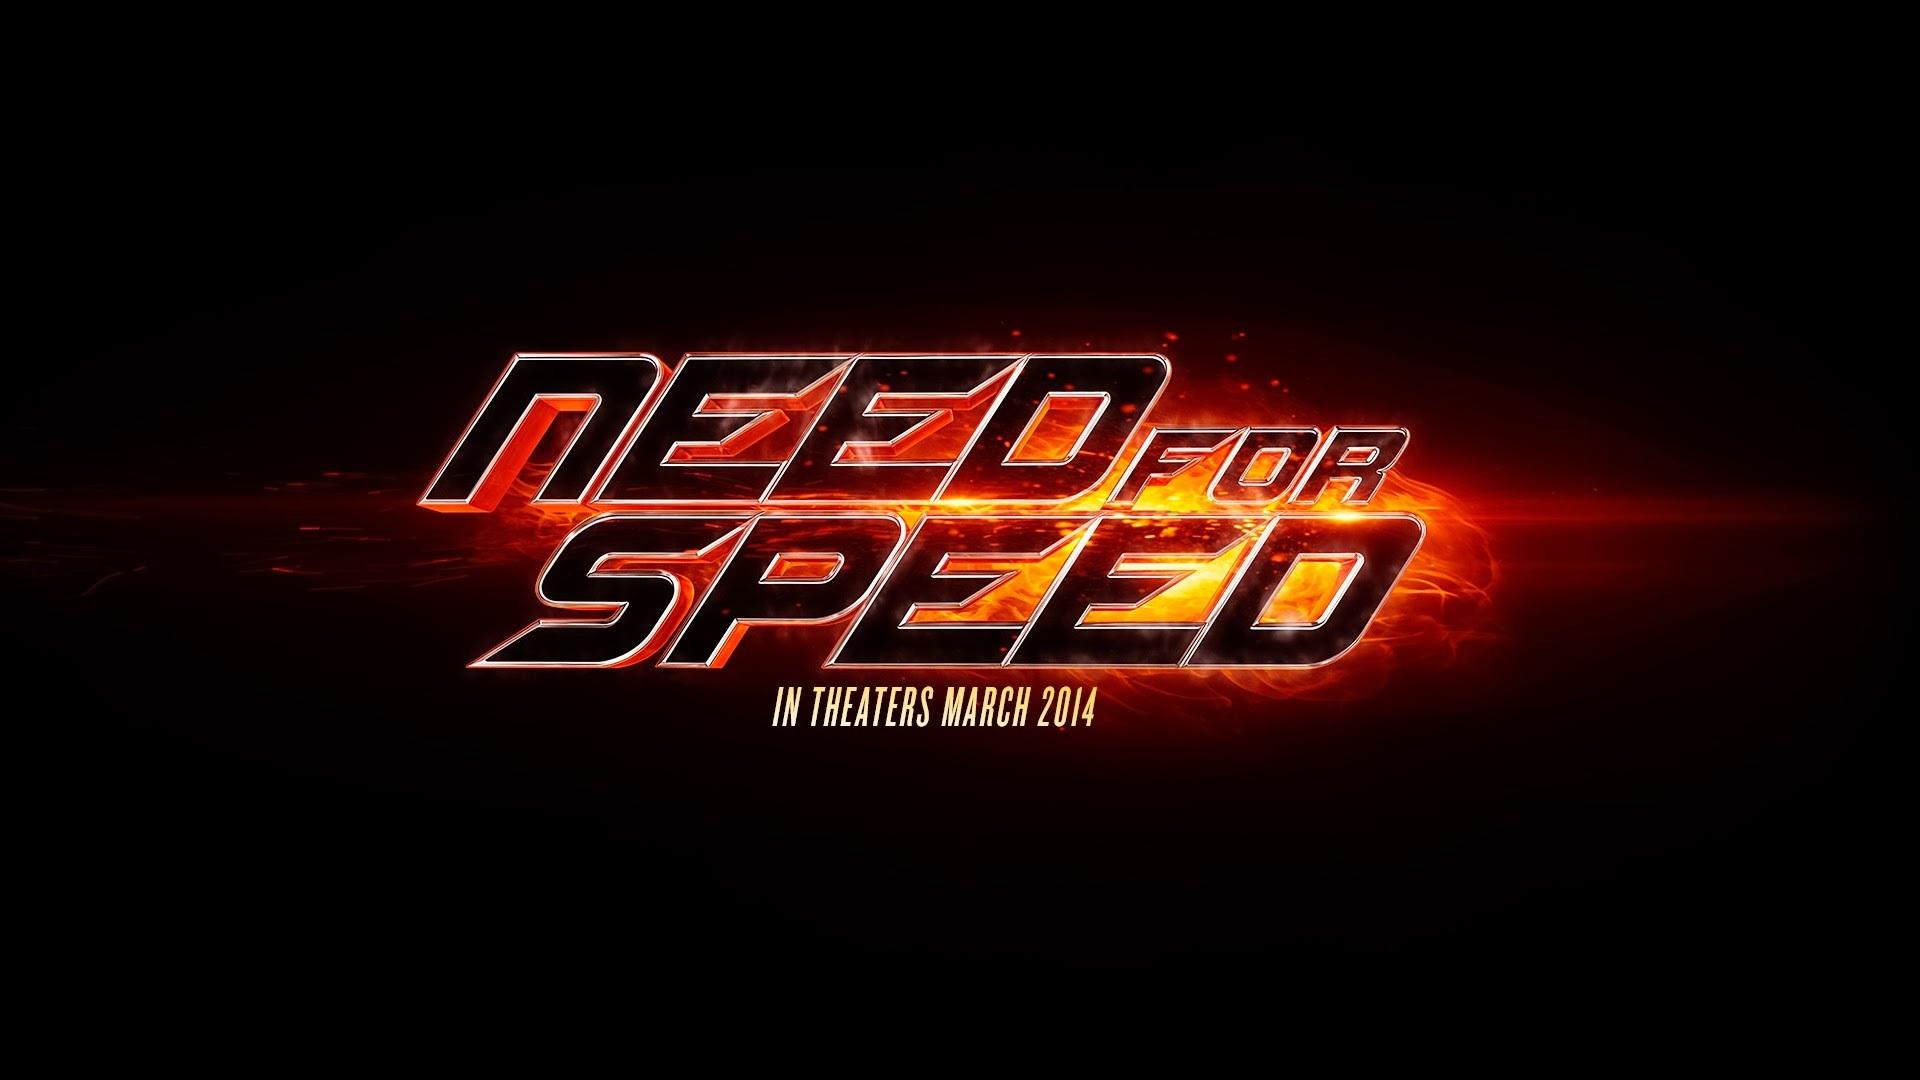 post oficial need for speed la pelicula foro cine tv vandal. Black Bedroom Furniture Sets. Home Design Ideas